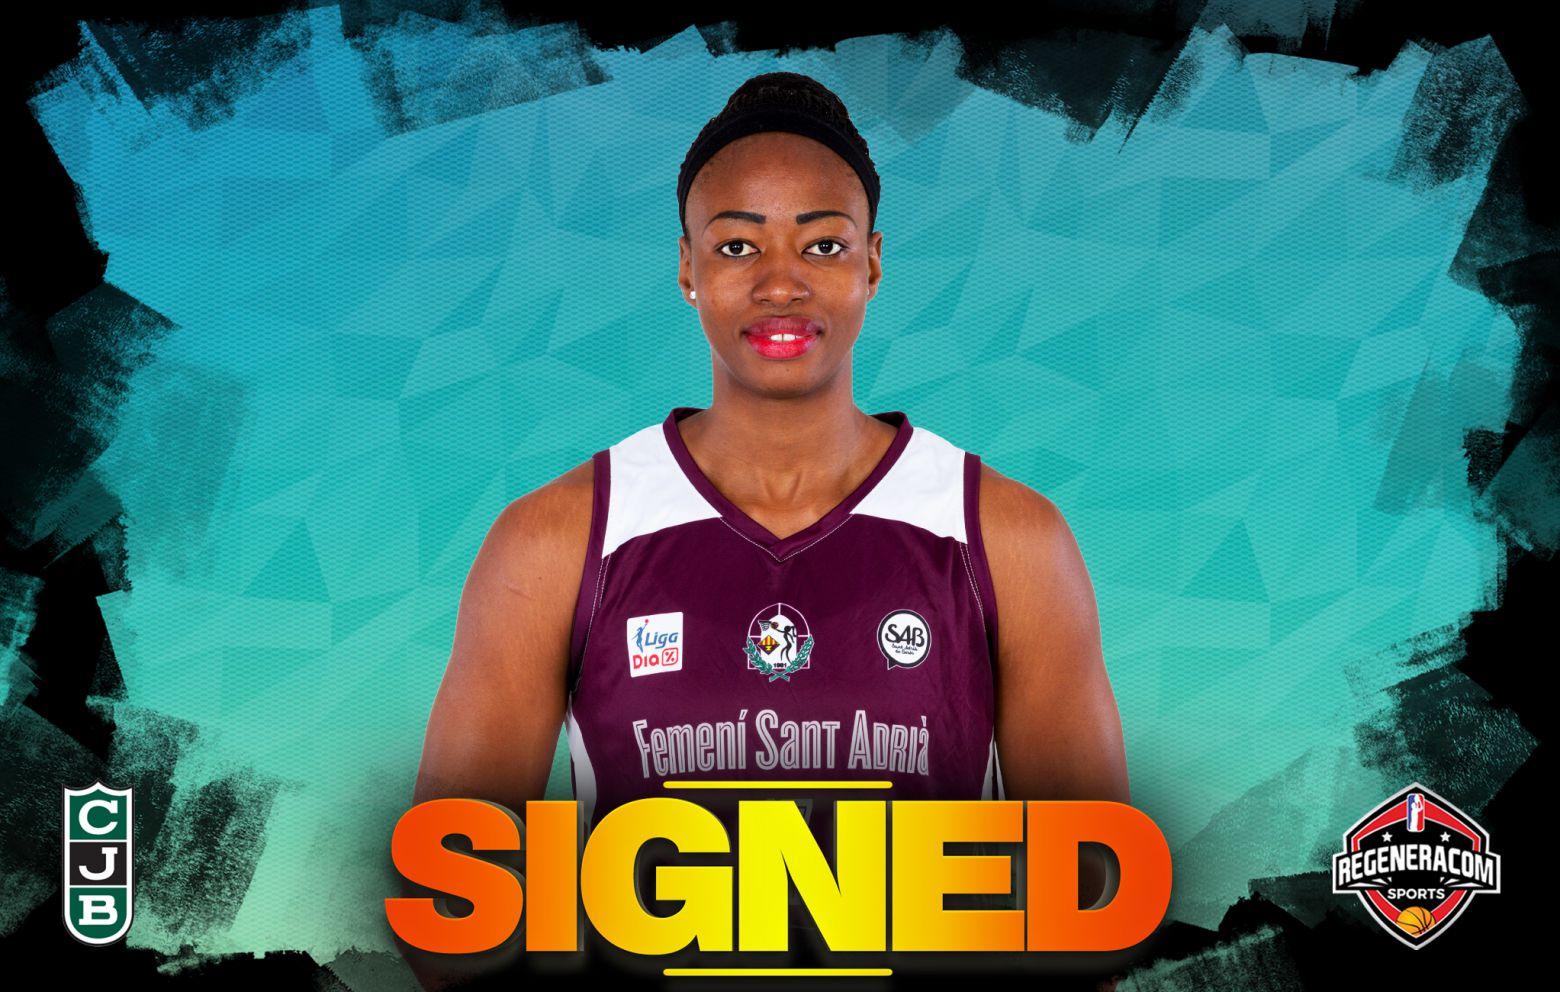 MINATA KEITA has signed with Joventut Badalona